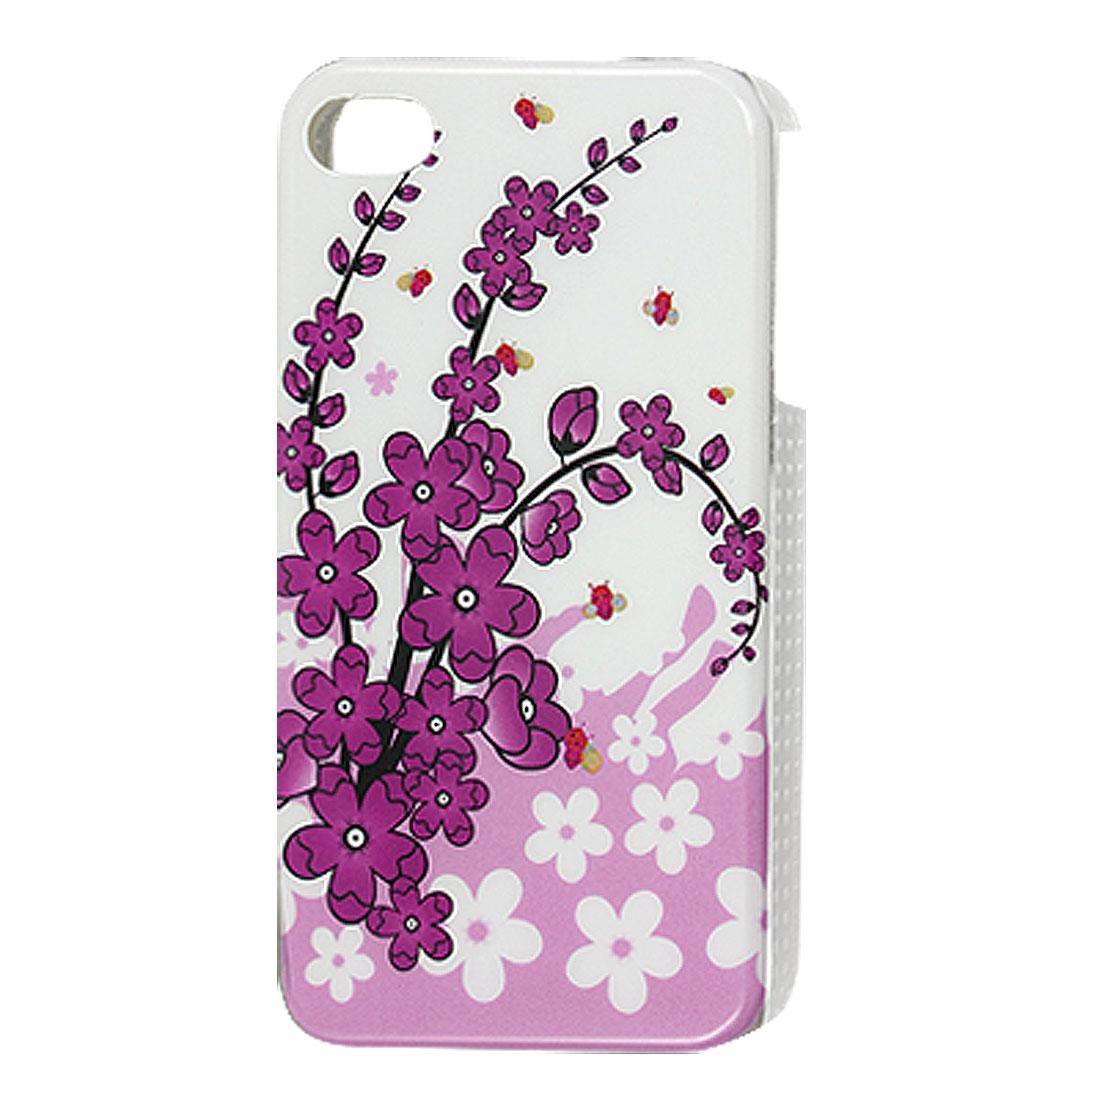 Purple White Flower Plastic IMD Back Cover Case for iPhone 4 4G 4S